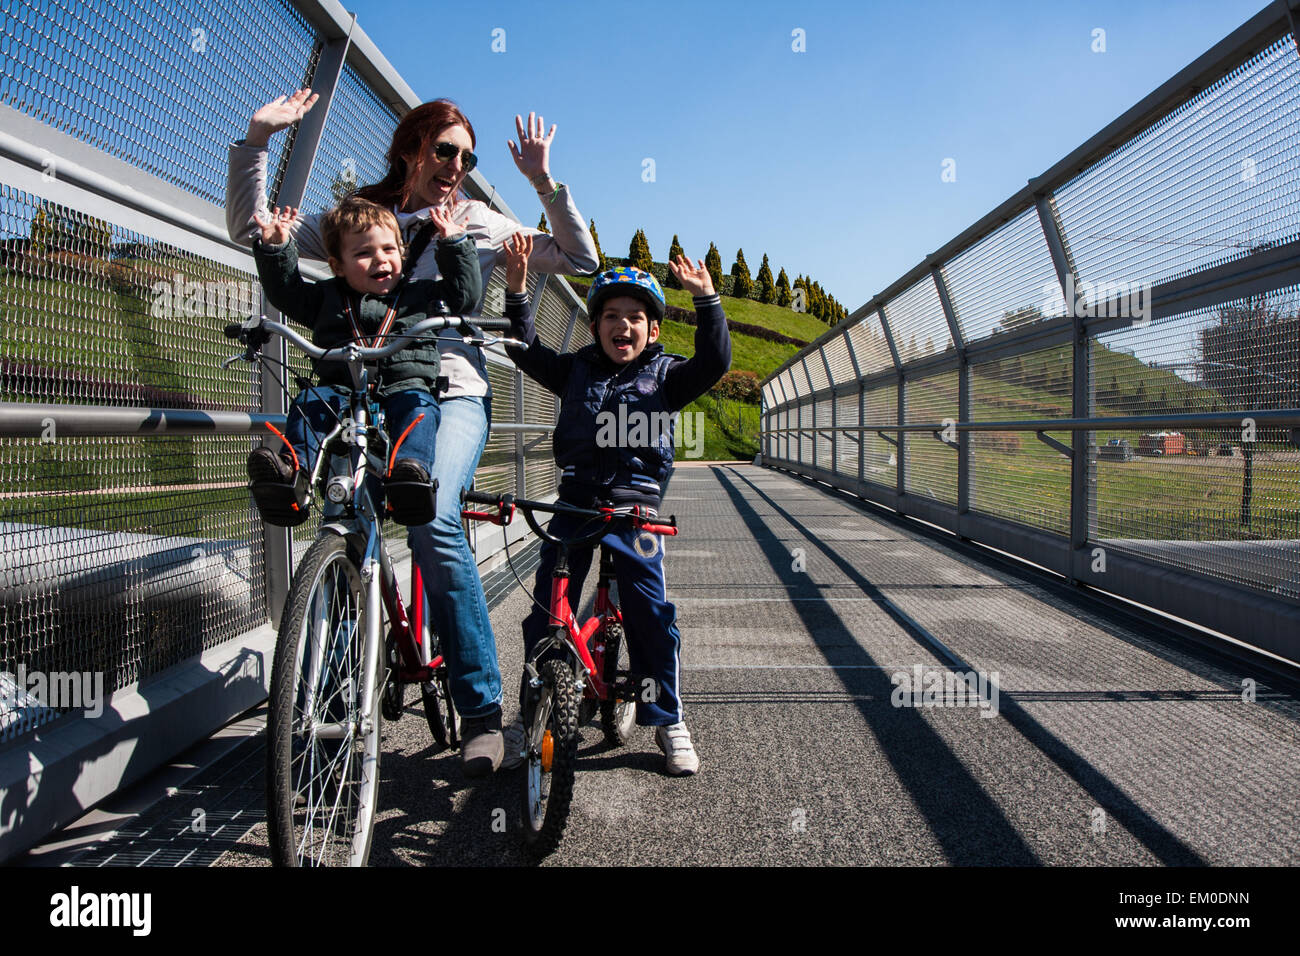 Moderne Stahl-Zyklus-Brücke verbindet den Stadtpark Stockfoto